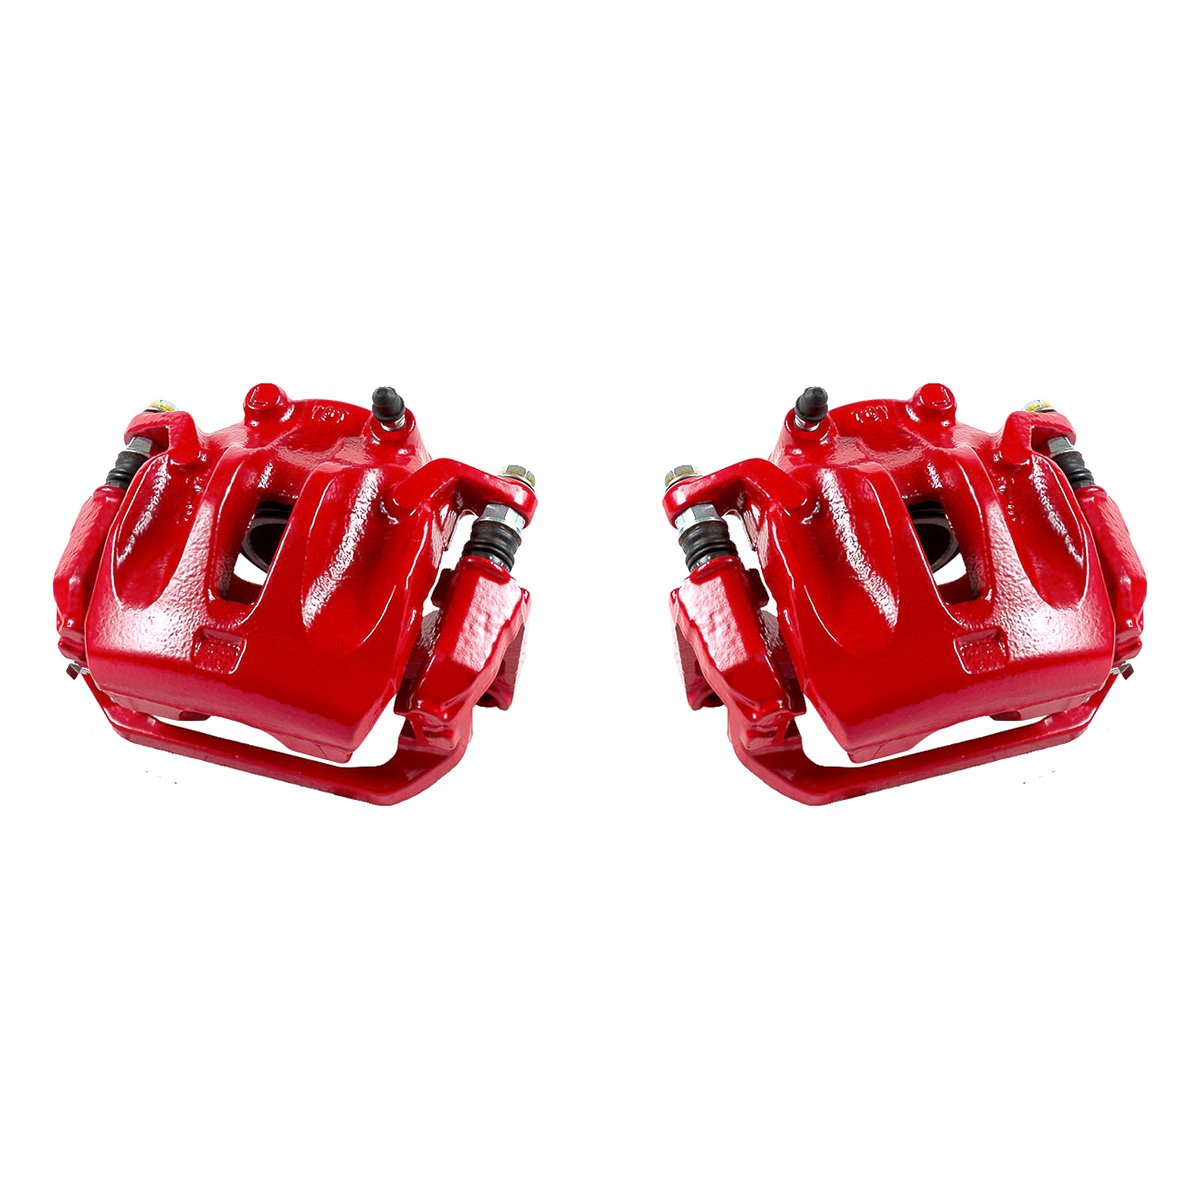 CK00953 [ 2 ] FRONT Performance Grade Red Powder Coated Semi-Loaded Caliper Assembly Pair Set Callahan Brake Parts